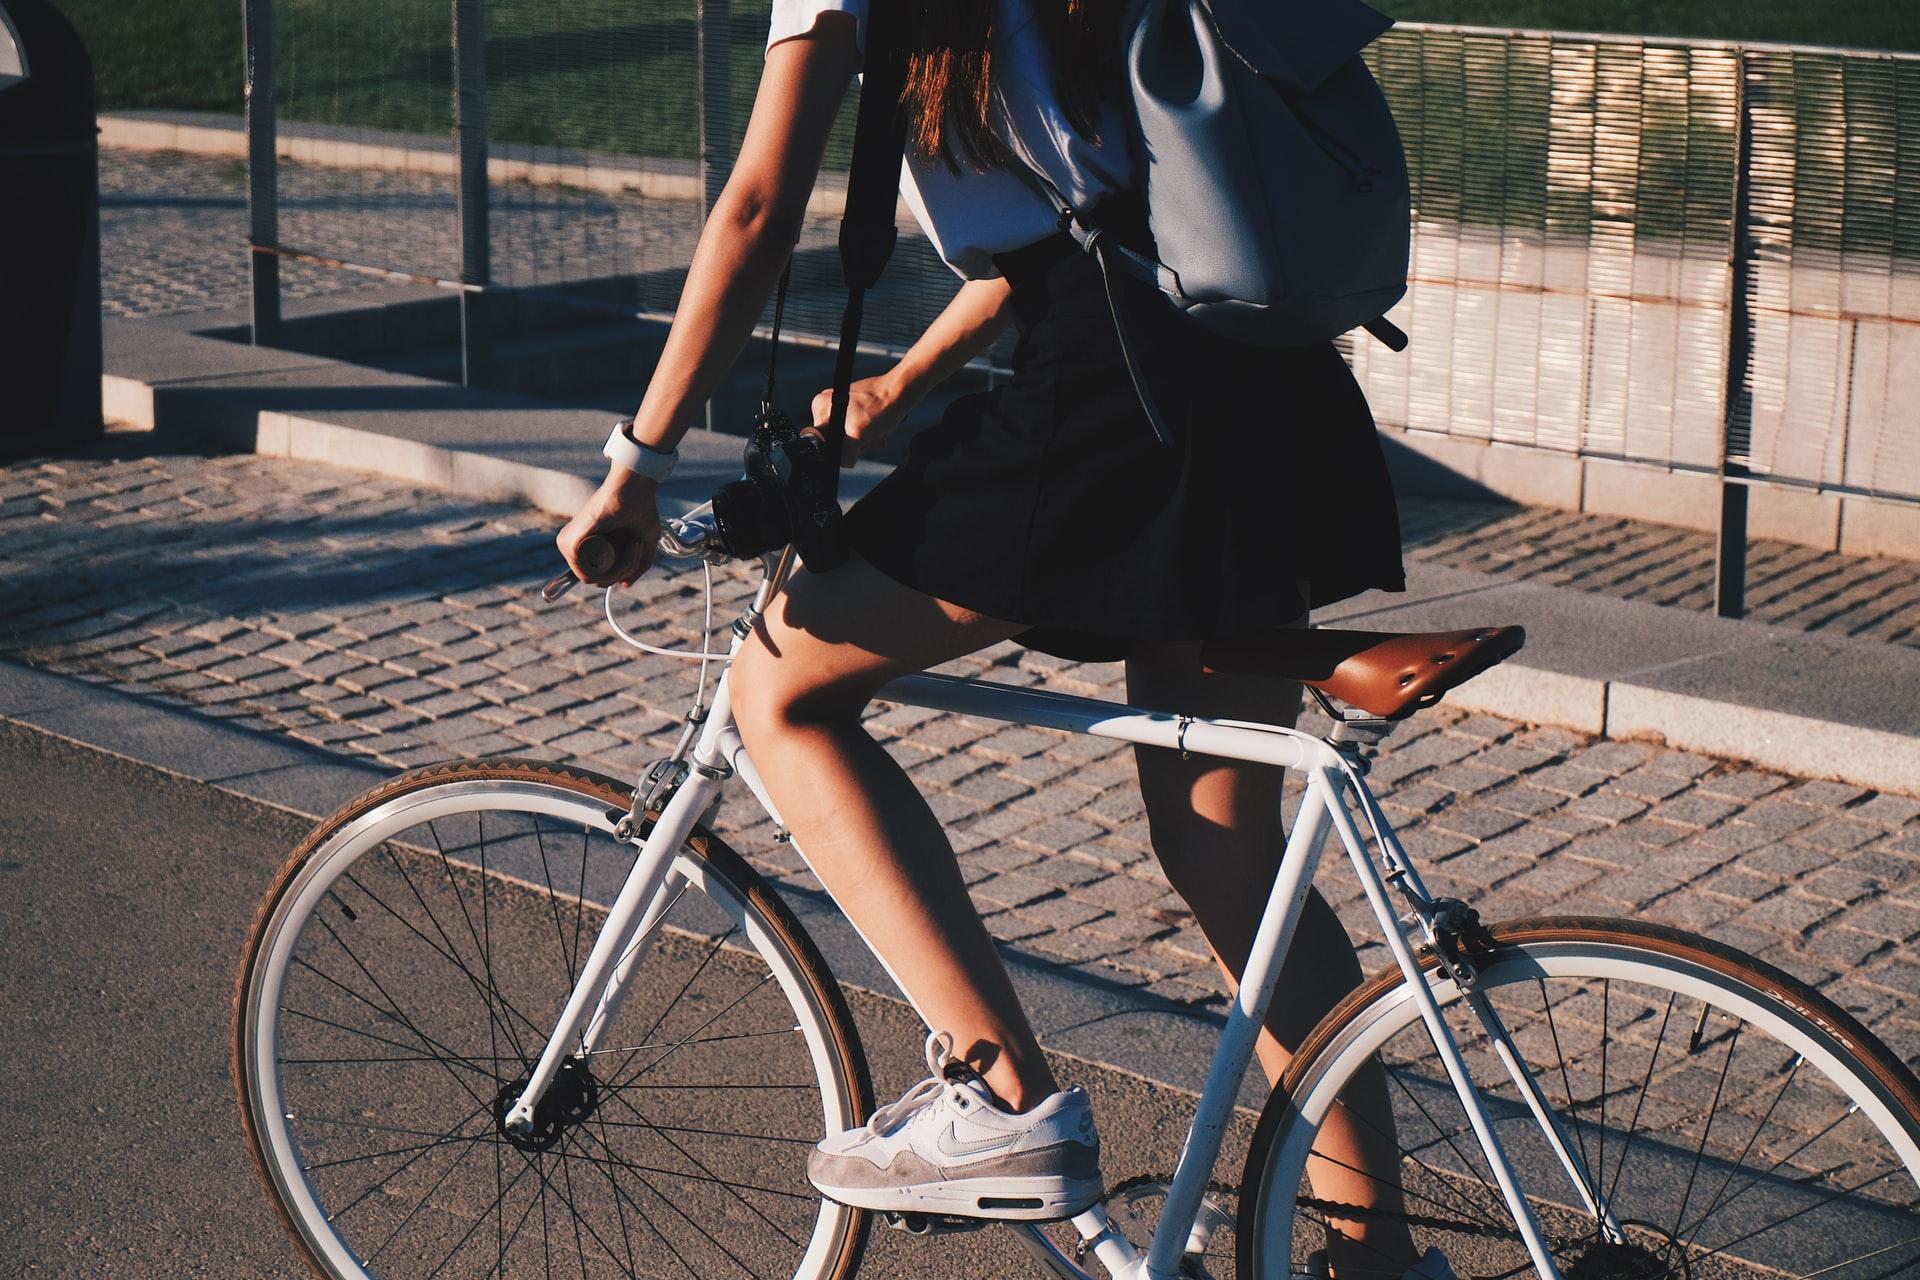 mobilit--sostenibile